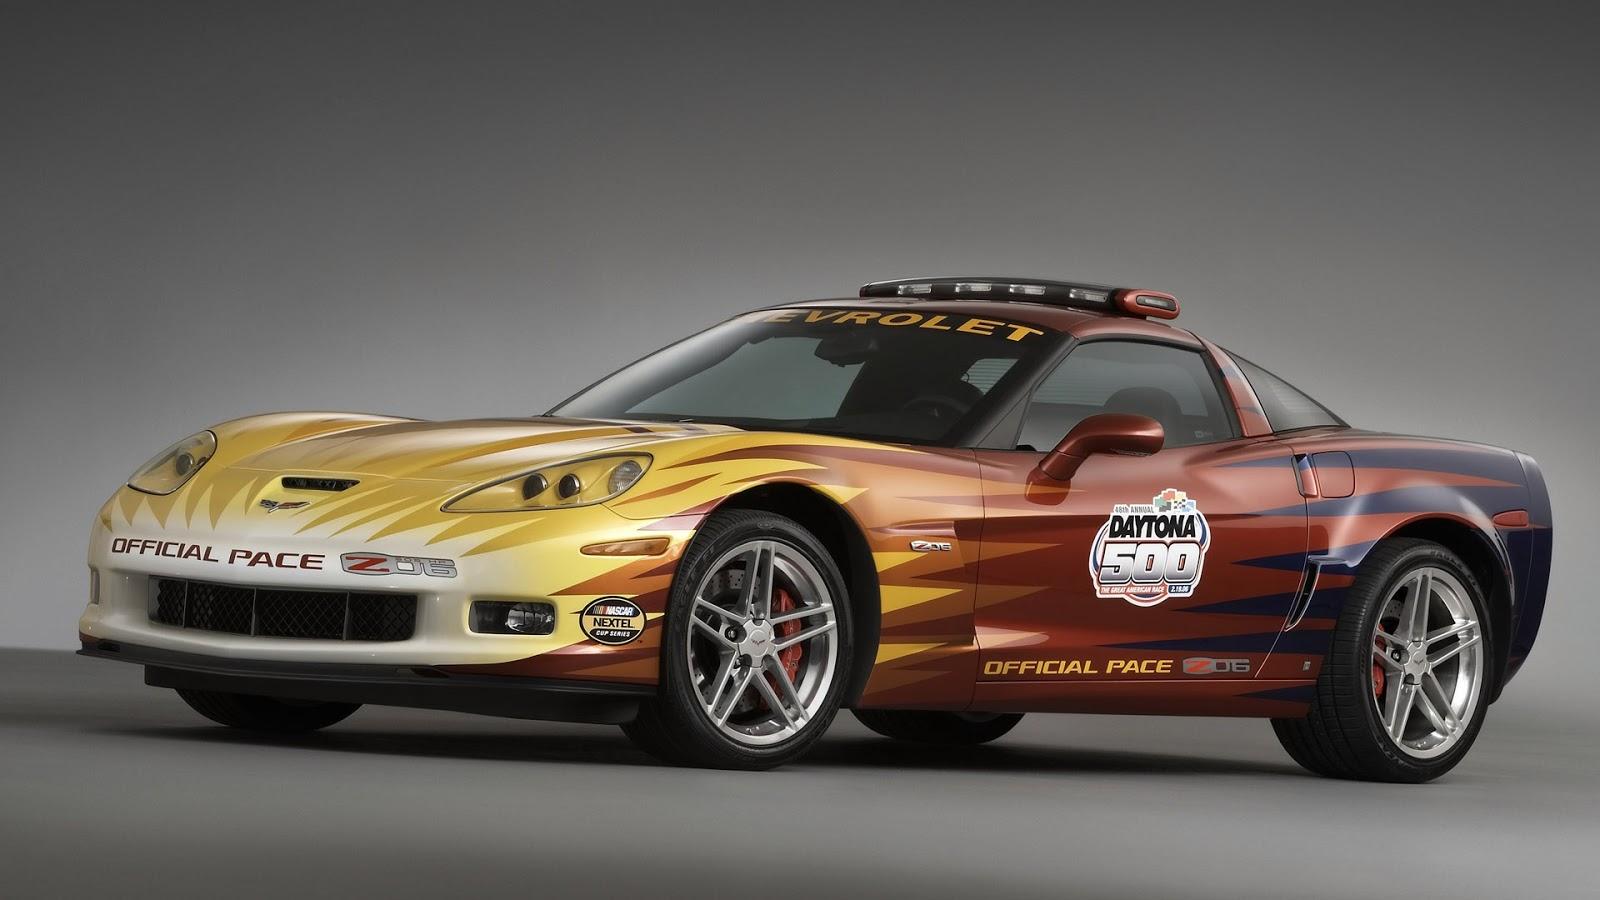 Daytona 500 Z06 Sports Car